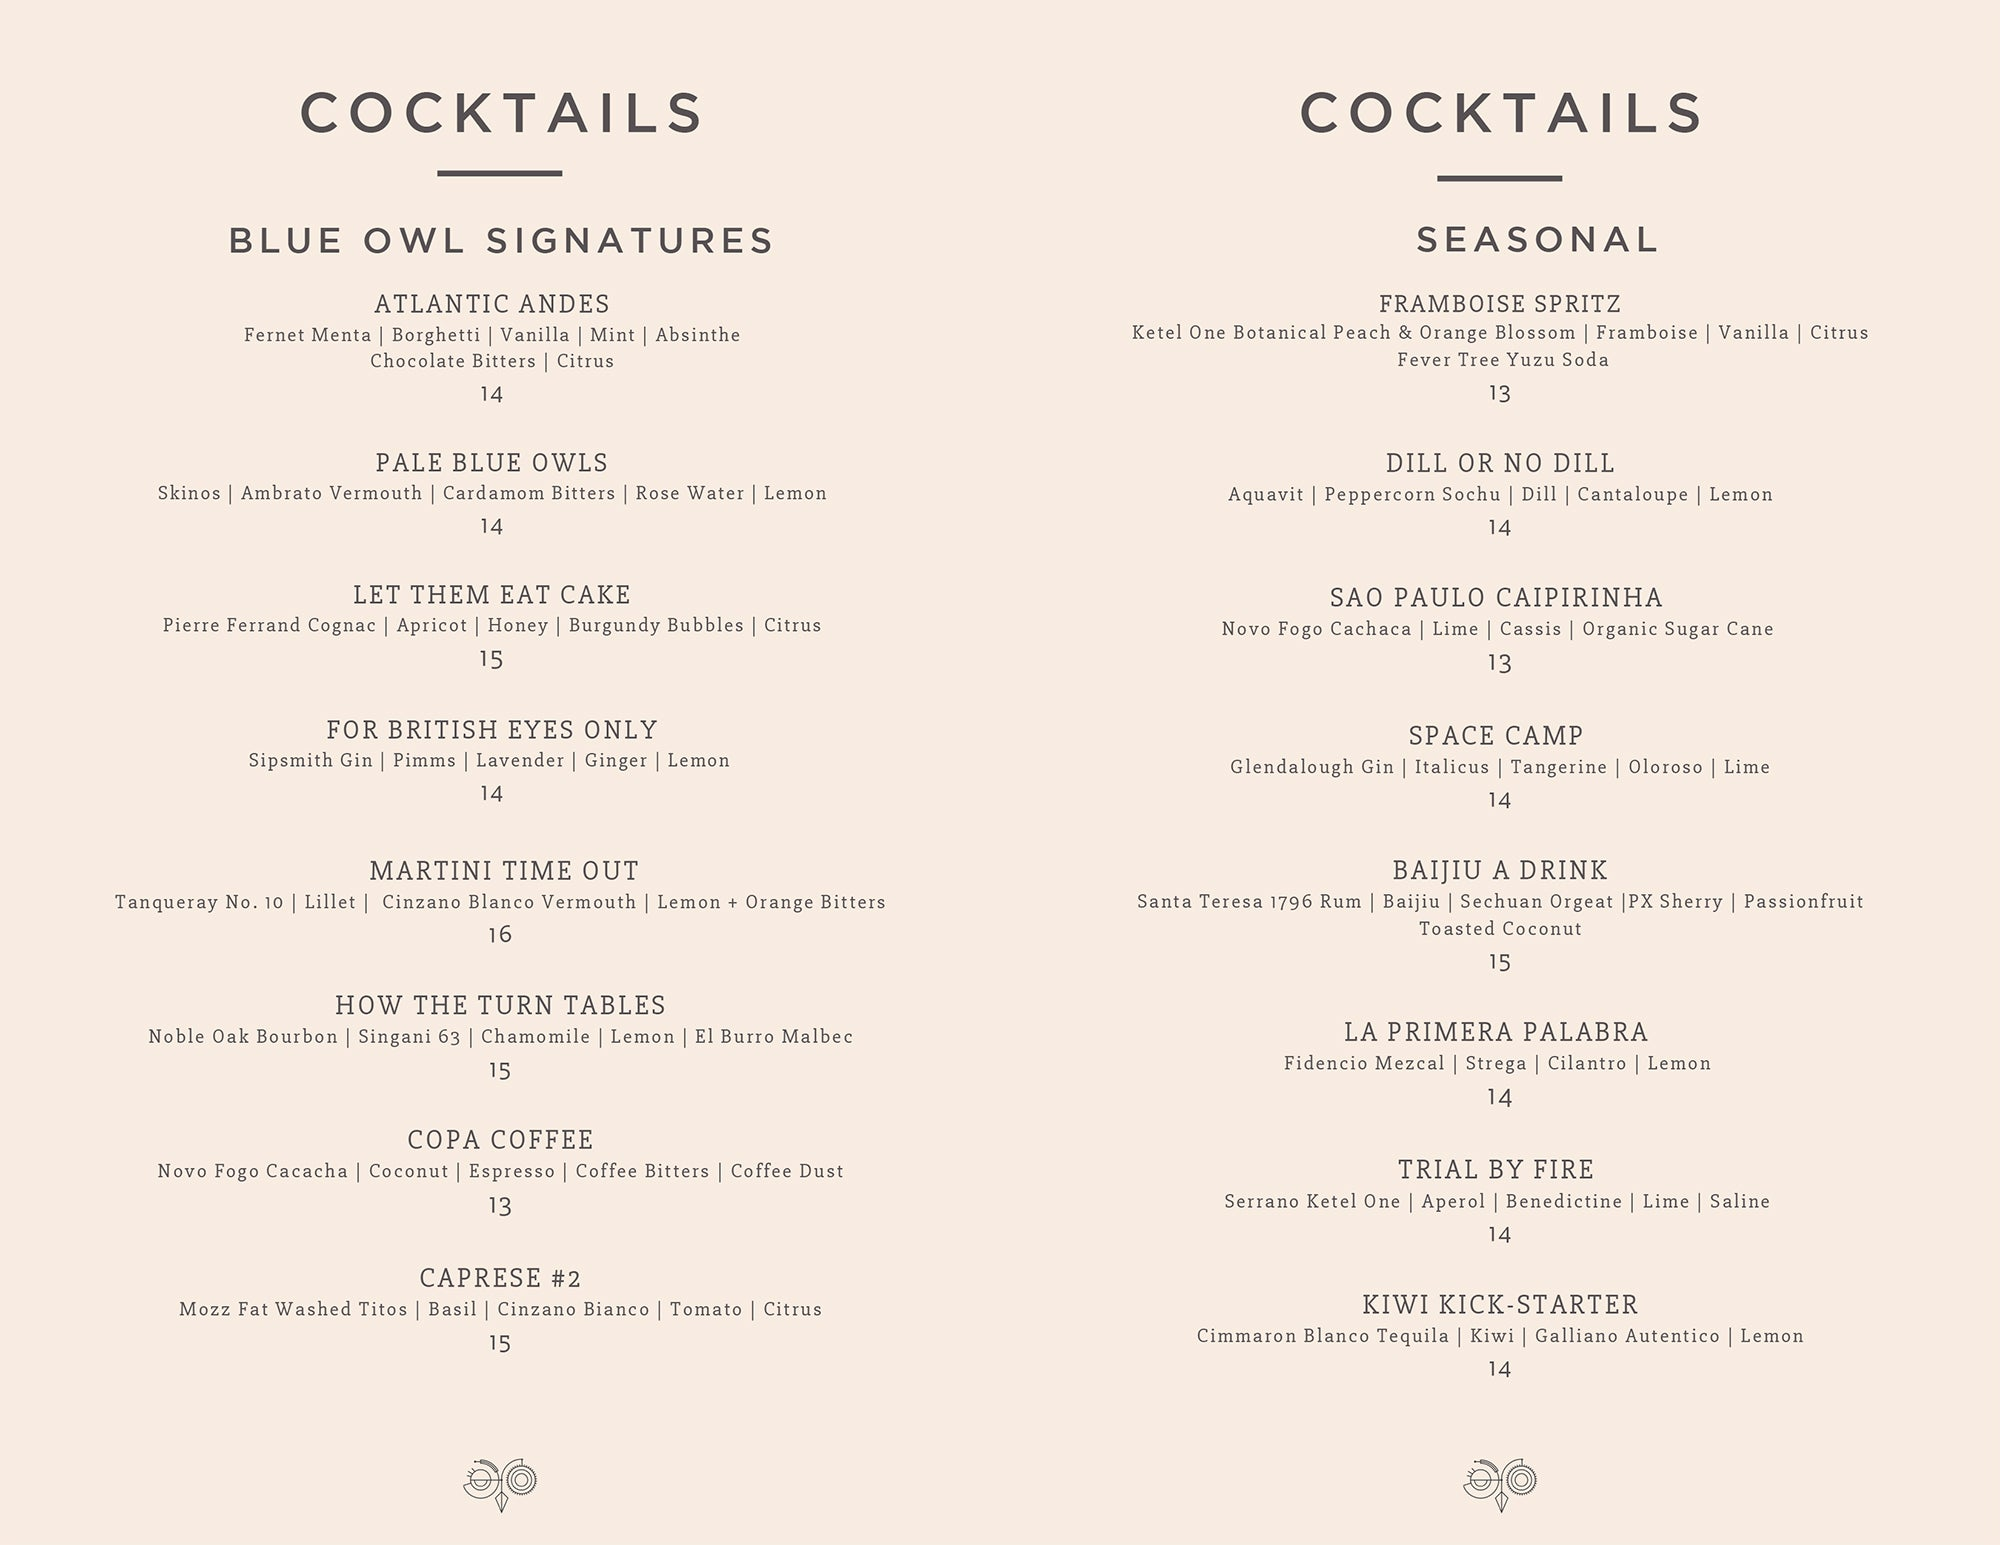 Blue Owl cocktail menu